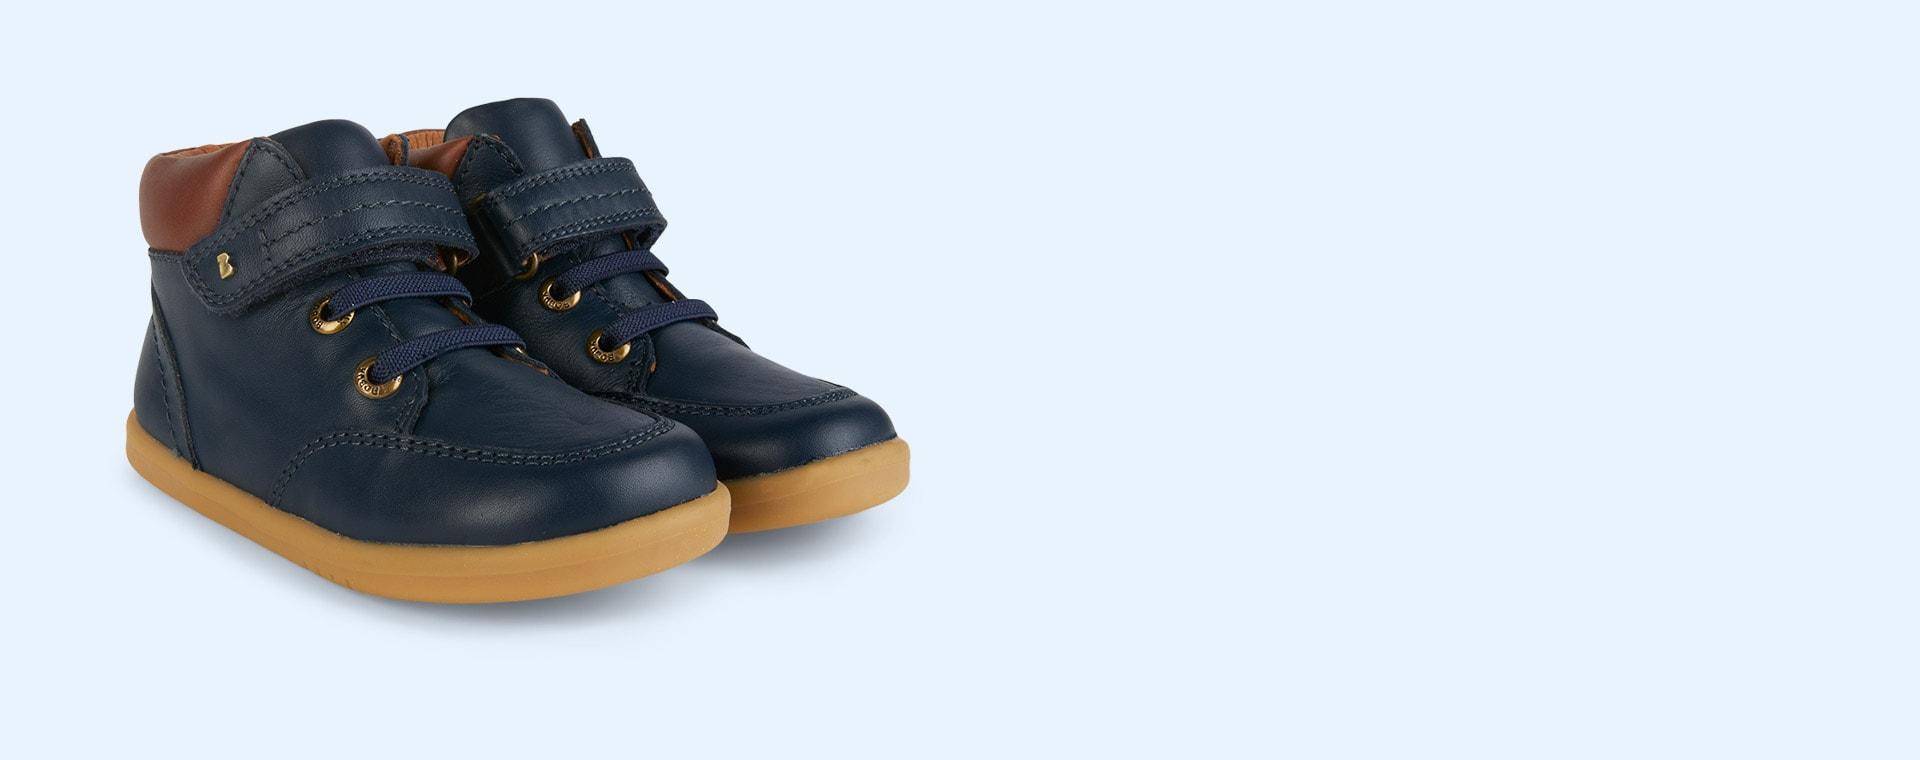 New Navy Bobux Timber I-Walk Boot